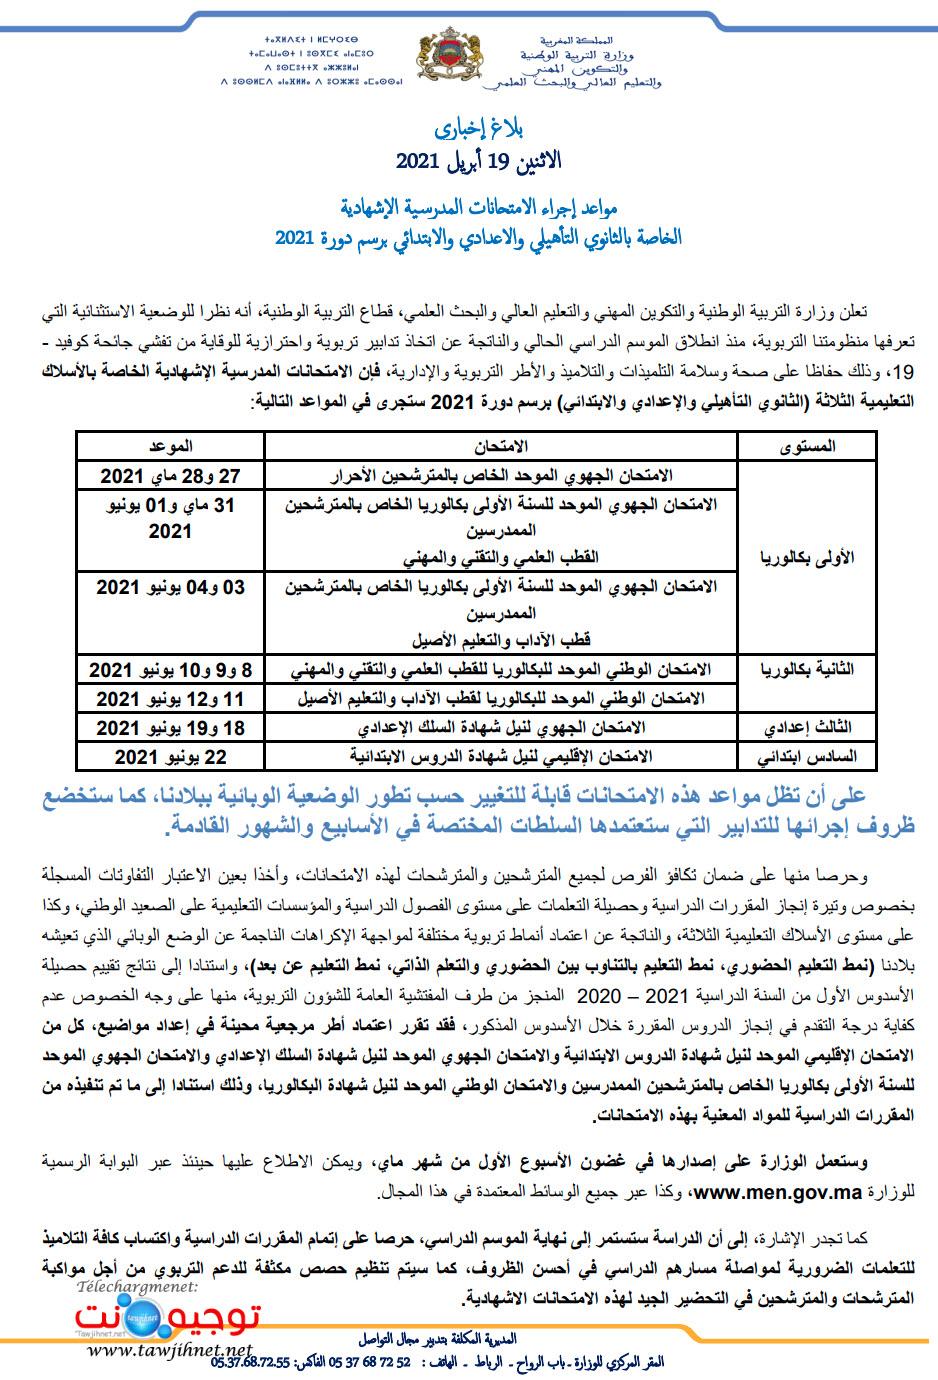 examen-bac-2021-national-reginal.jpg